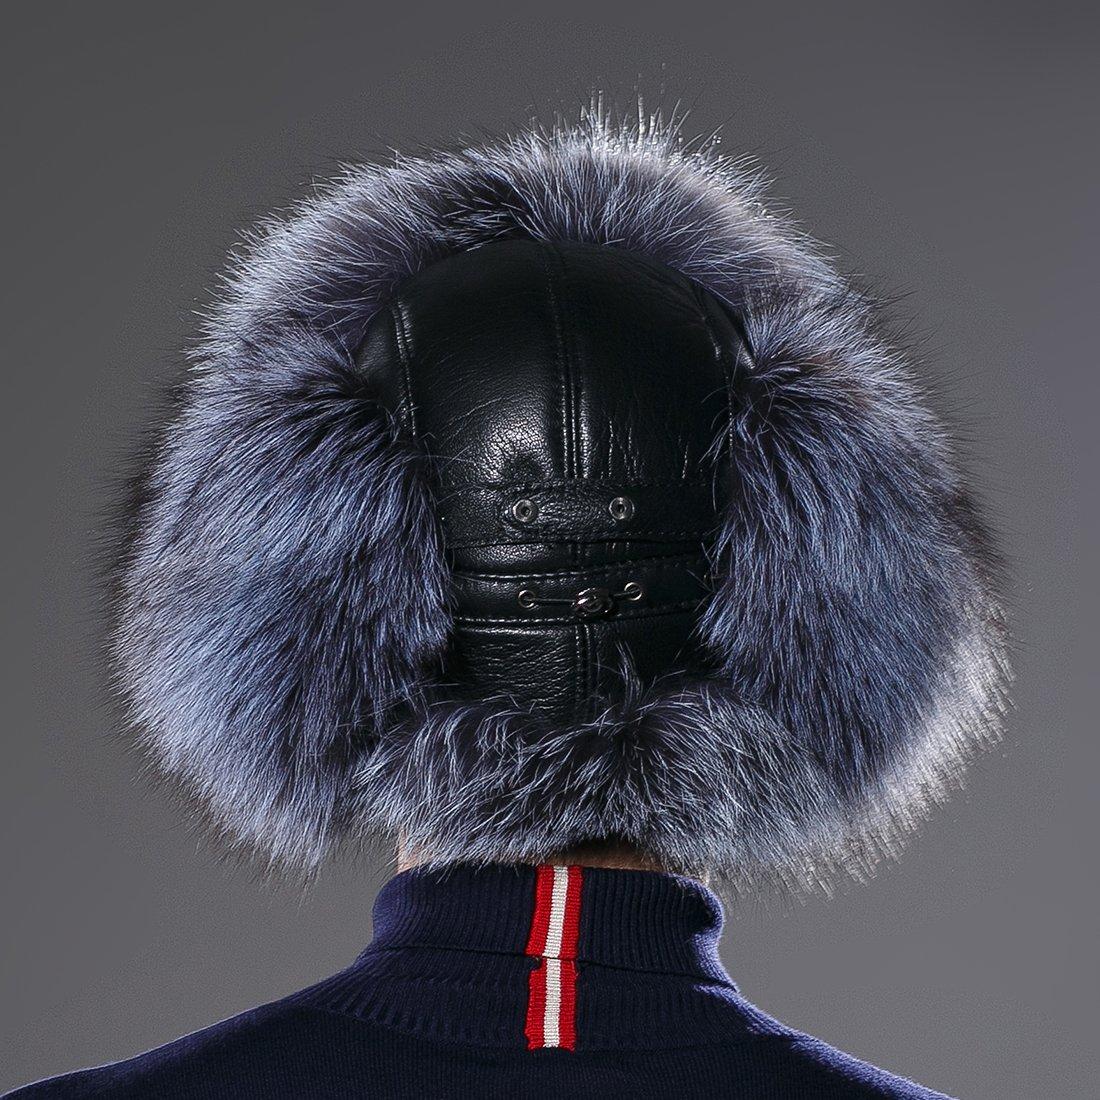 URSFUR Winter Mens Trapper Hat Real Leather Silver Fox Fur Russian Ushanka Cap by URSFUR (Image #4)